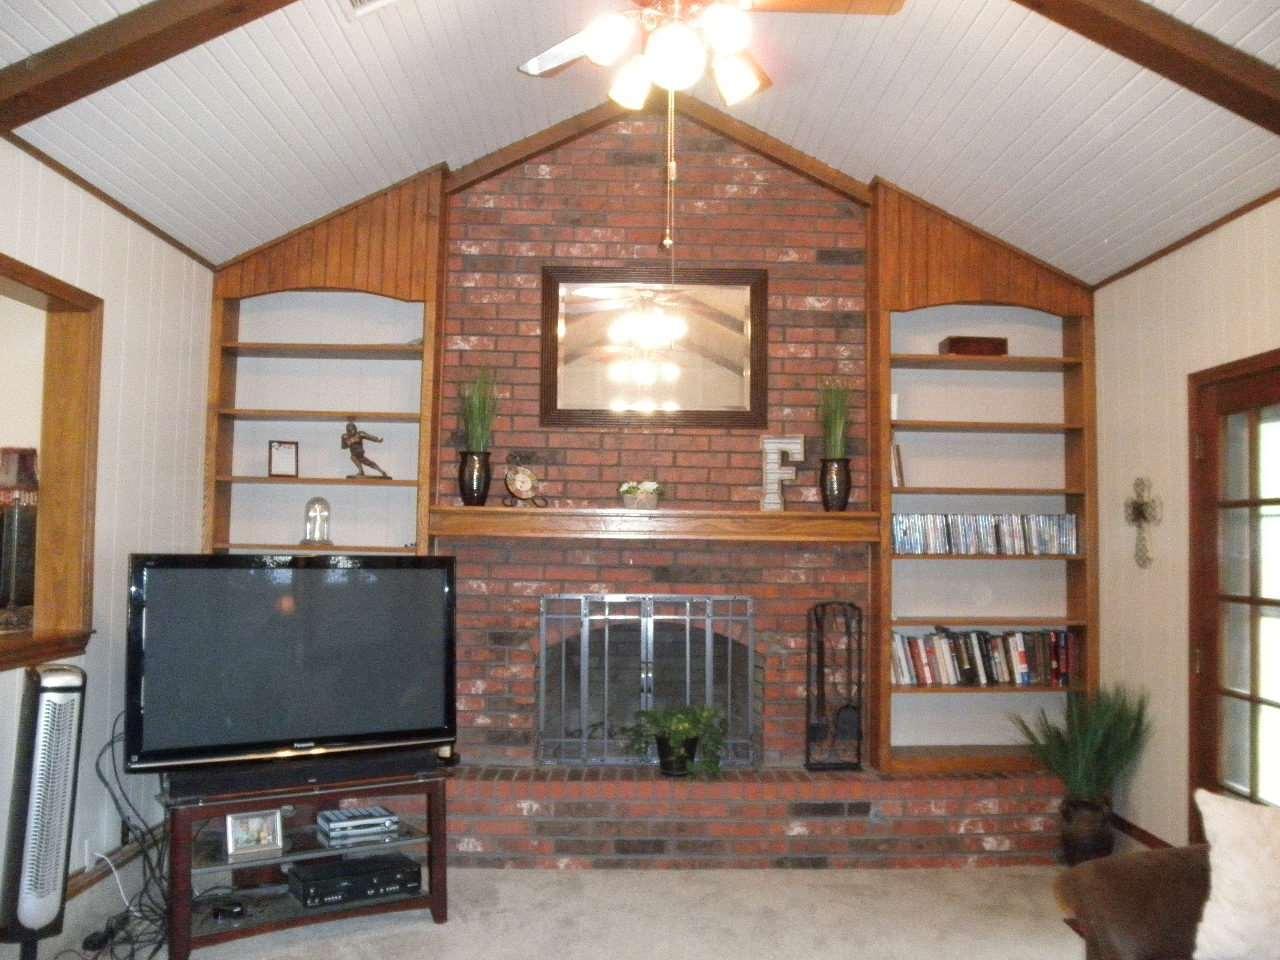 Sold Cross Sale W/ MLS | 2805 Ames  Ponca City, OK  1